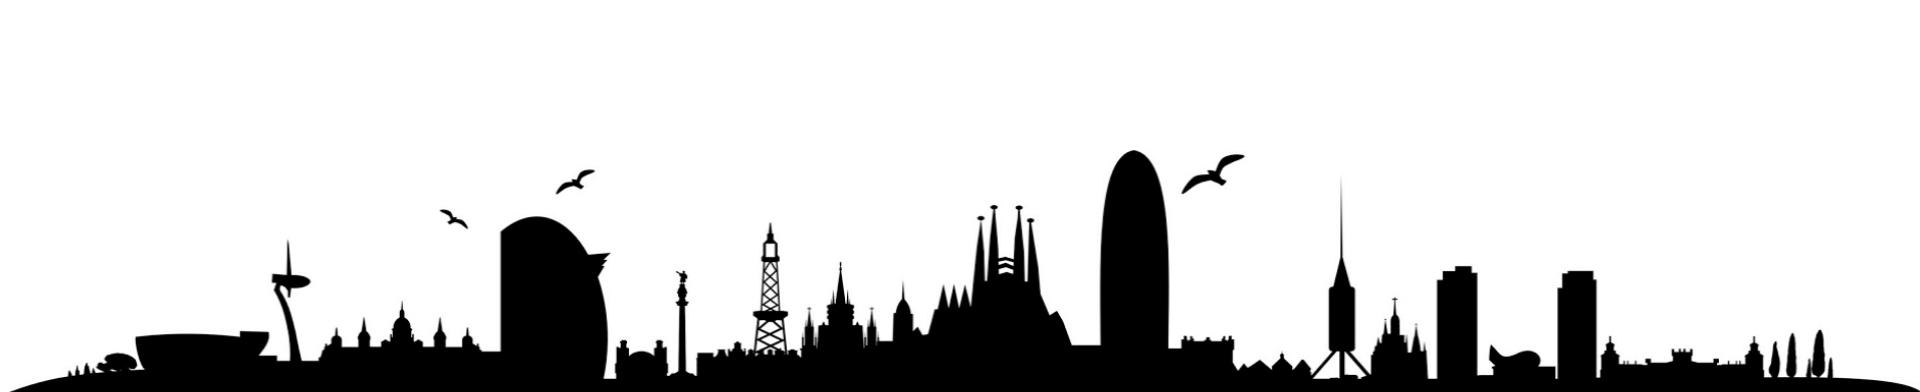 Barcelona Silhouette